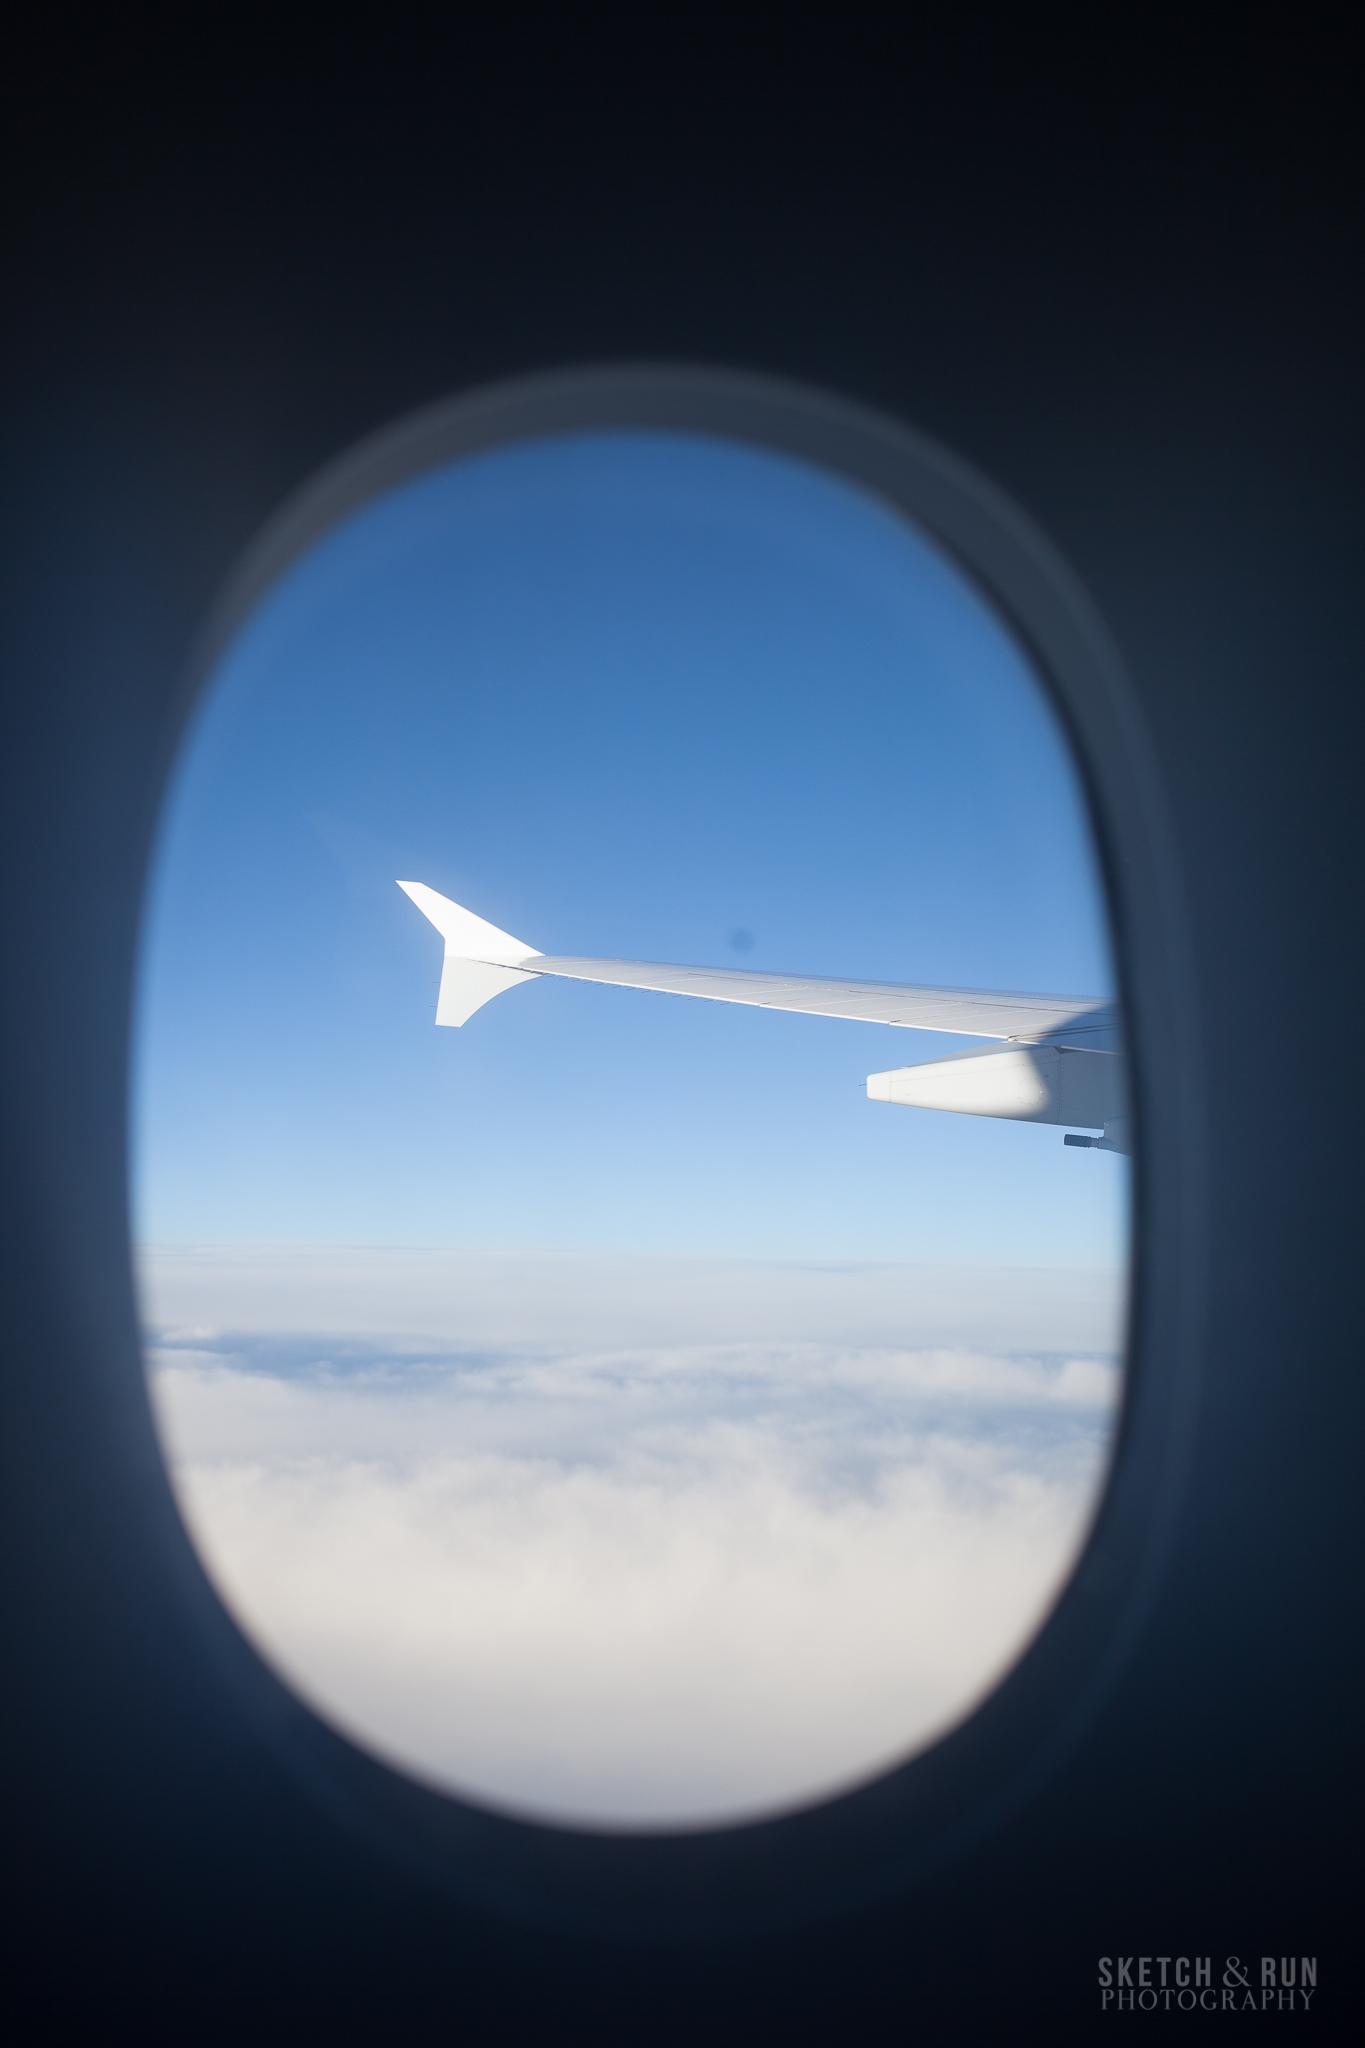 planewindow-6.jpg